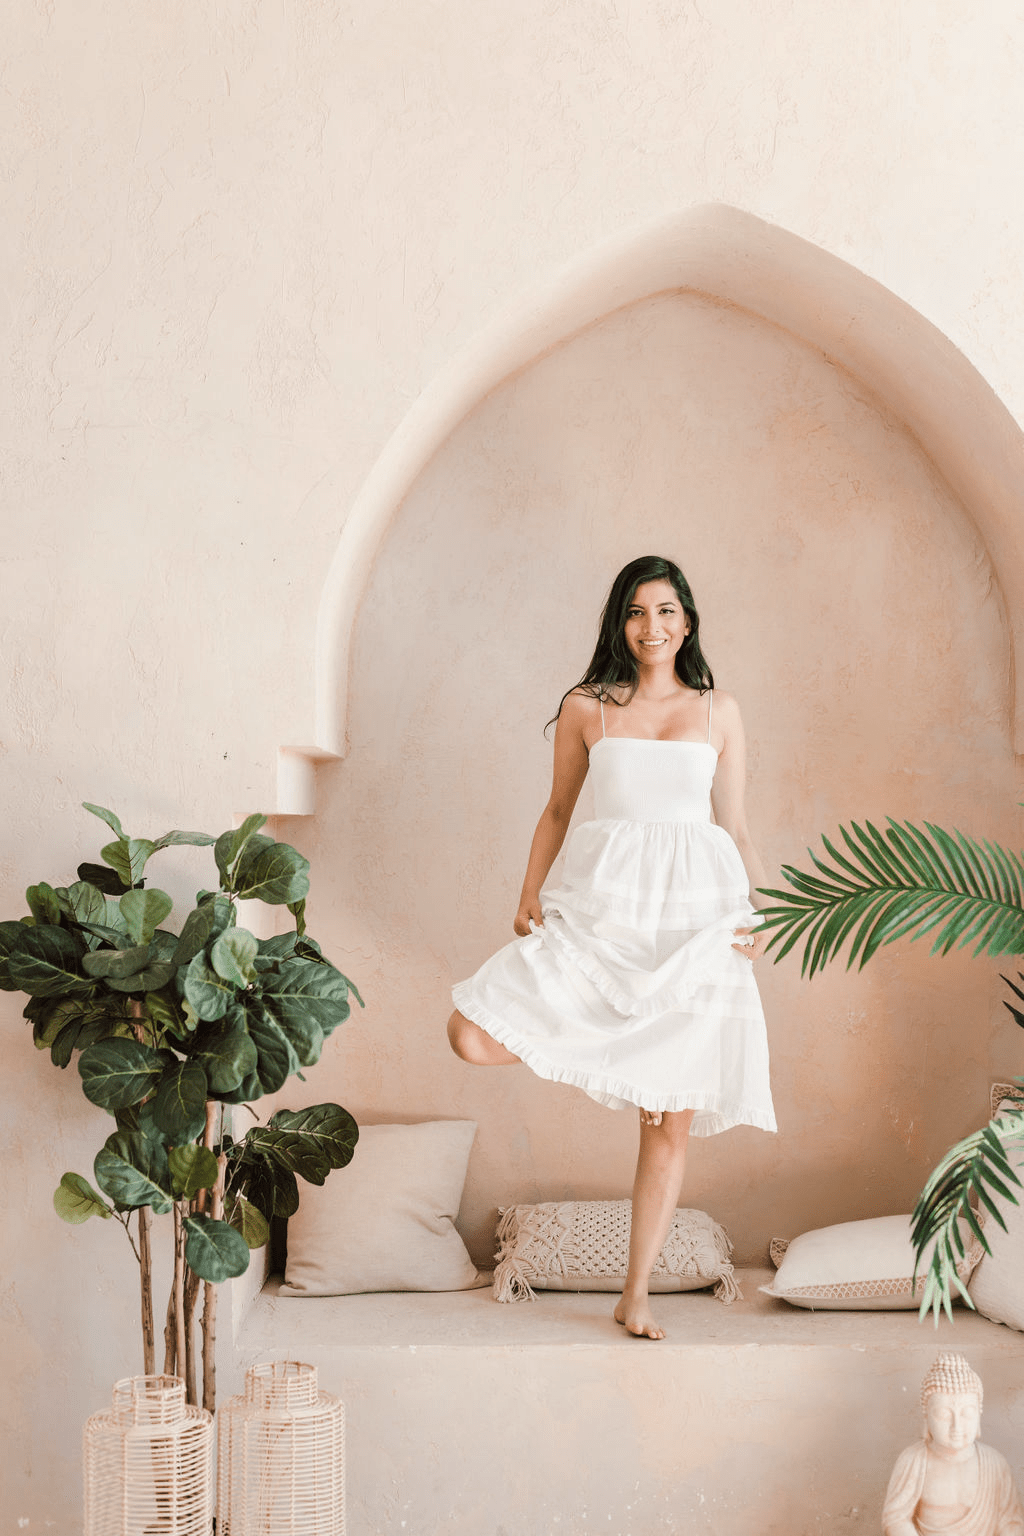 Mahara Mindfulness Co-founder Sheba